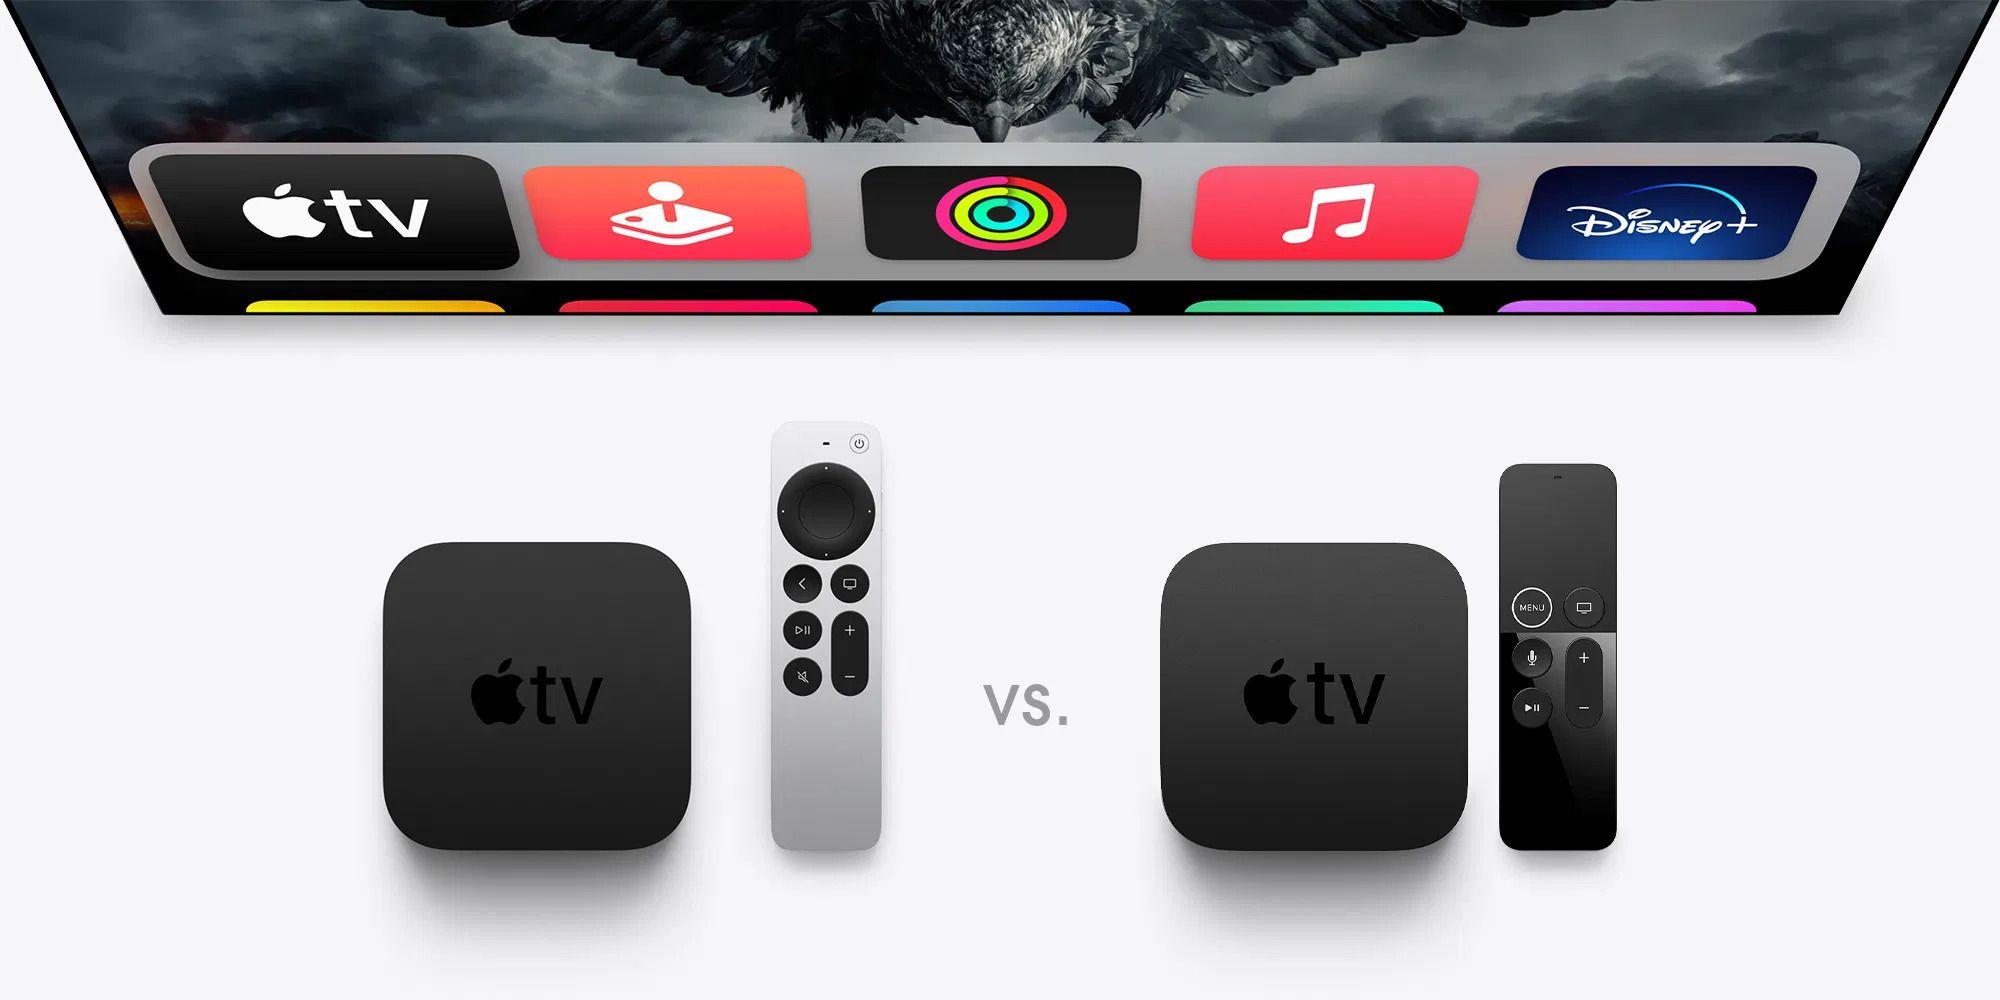 Apple TV 4K 2021 (esquerda) vs. Apple TV 4K 2017 (direita)